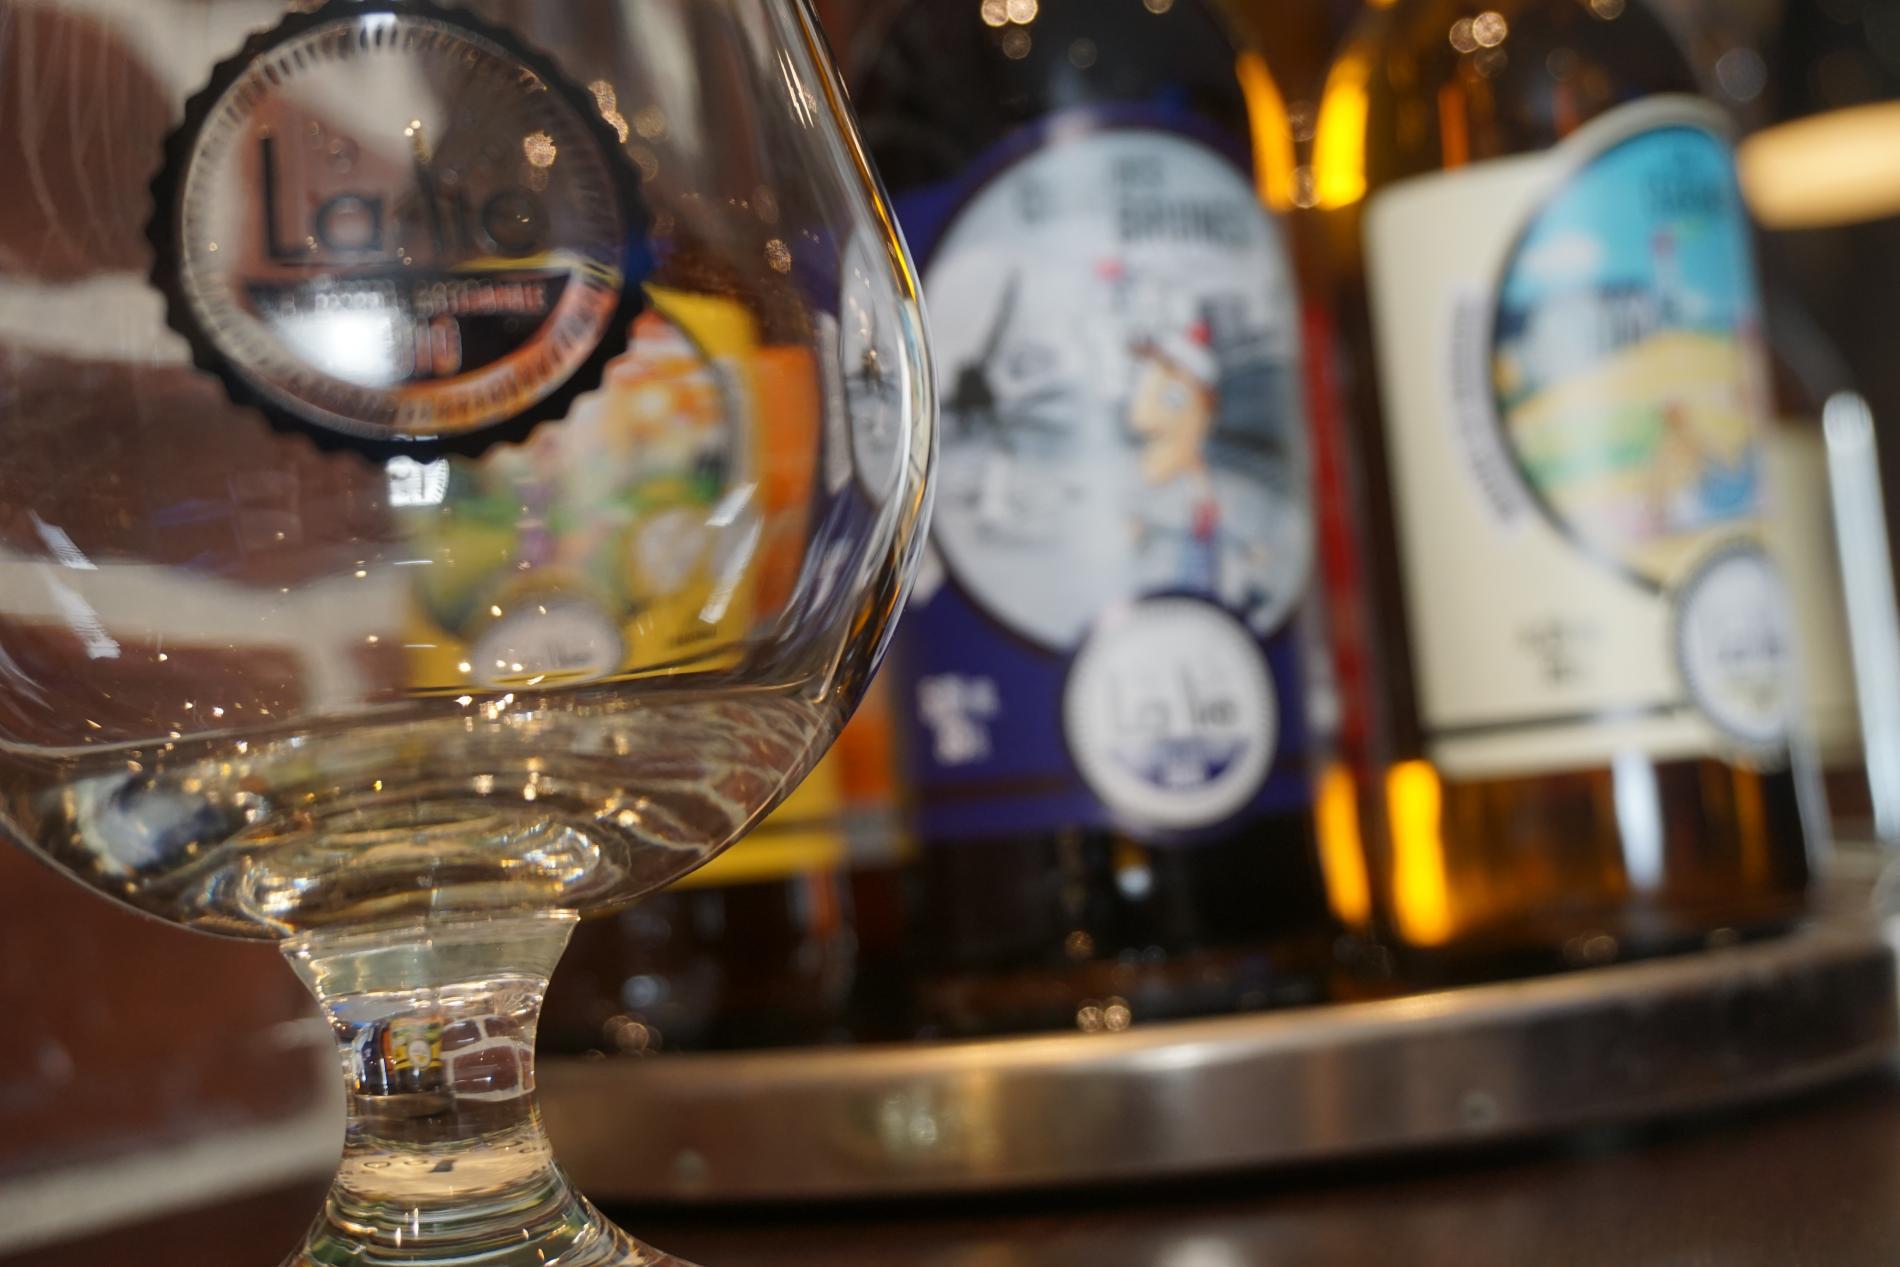 Norman Beer at the bar de la Couronne